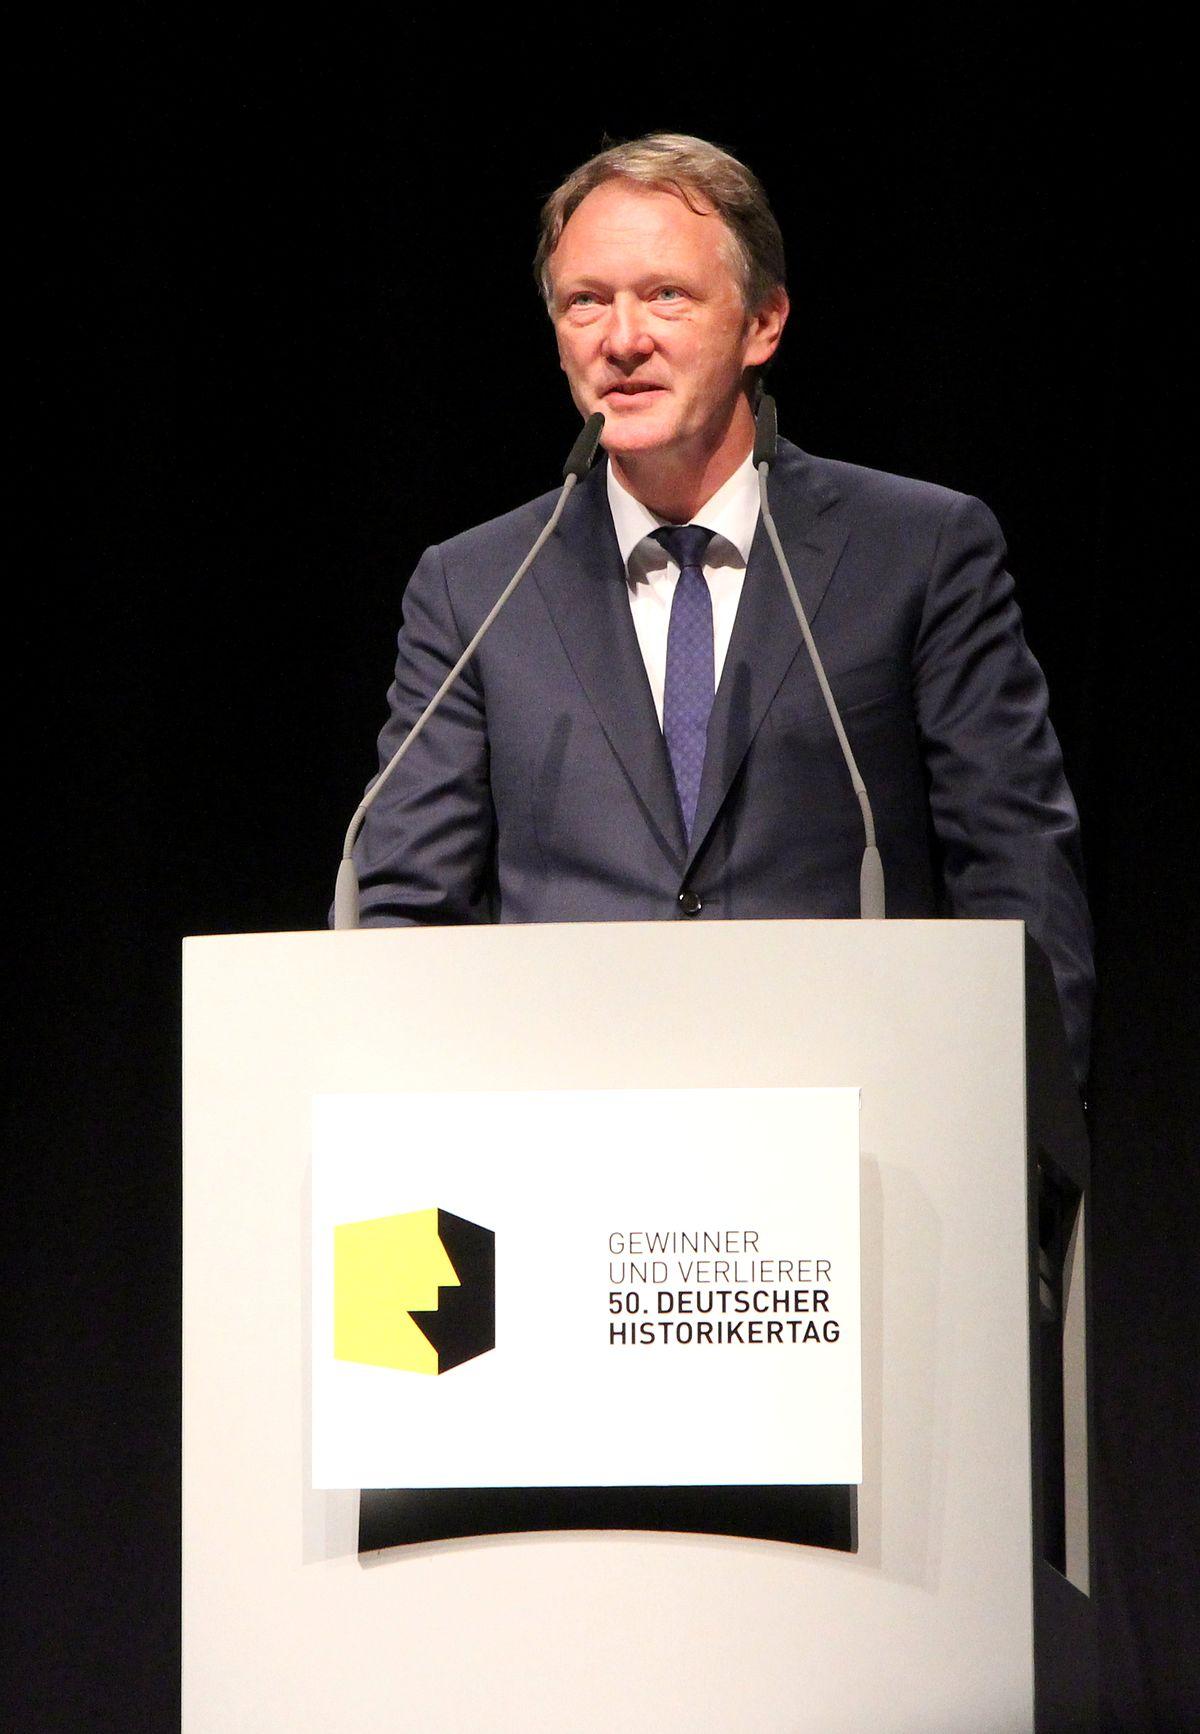 Martin Schulze Wessel